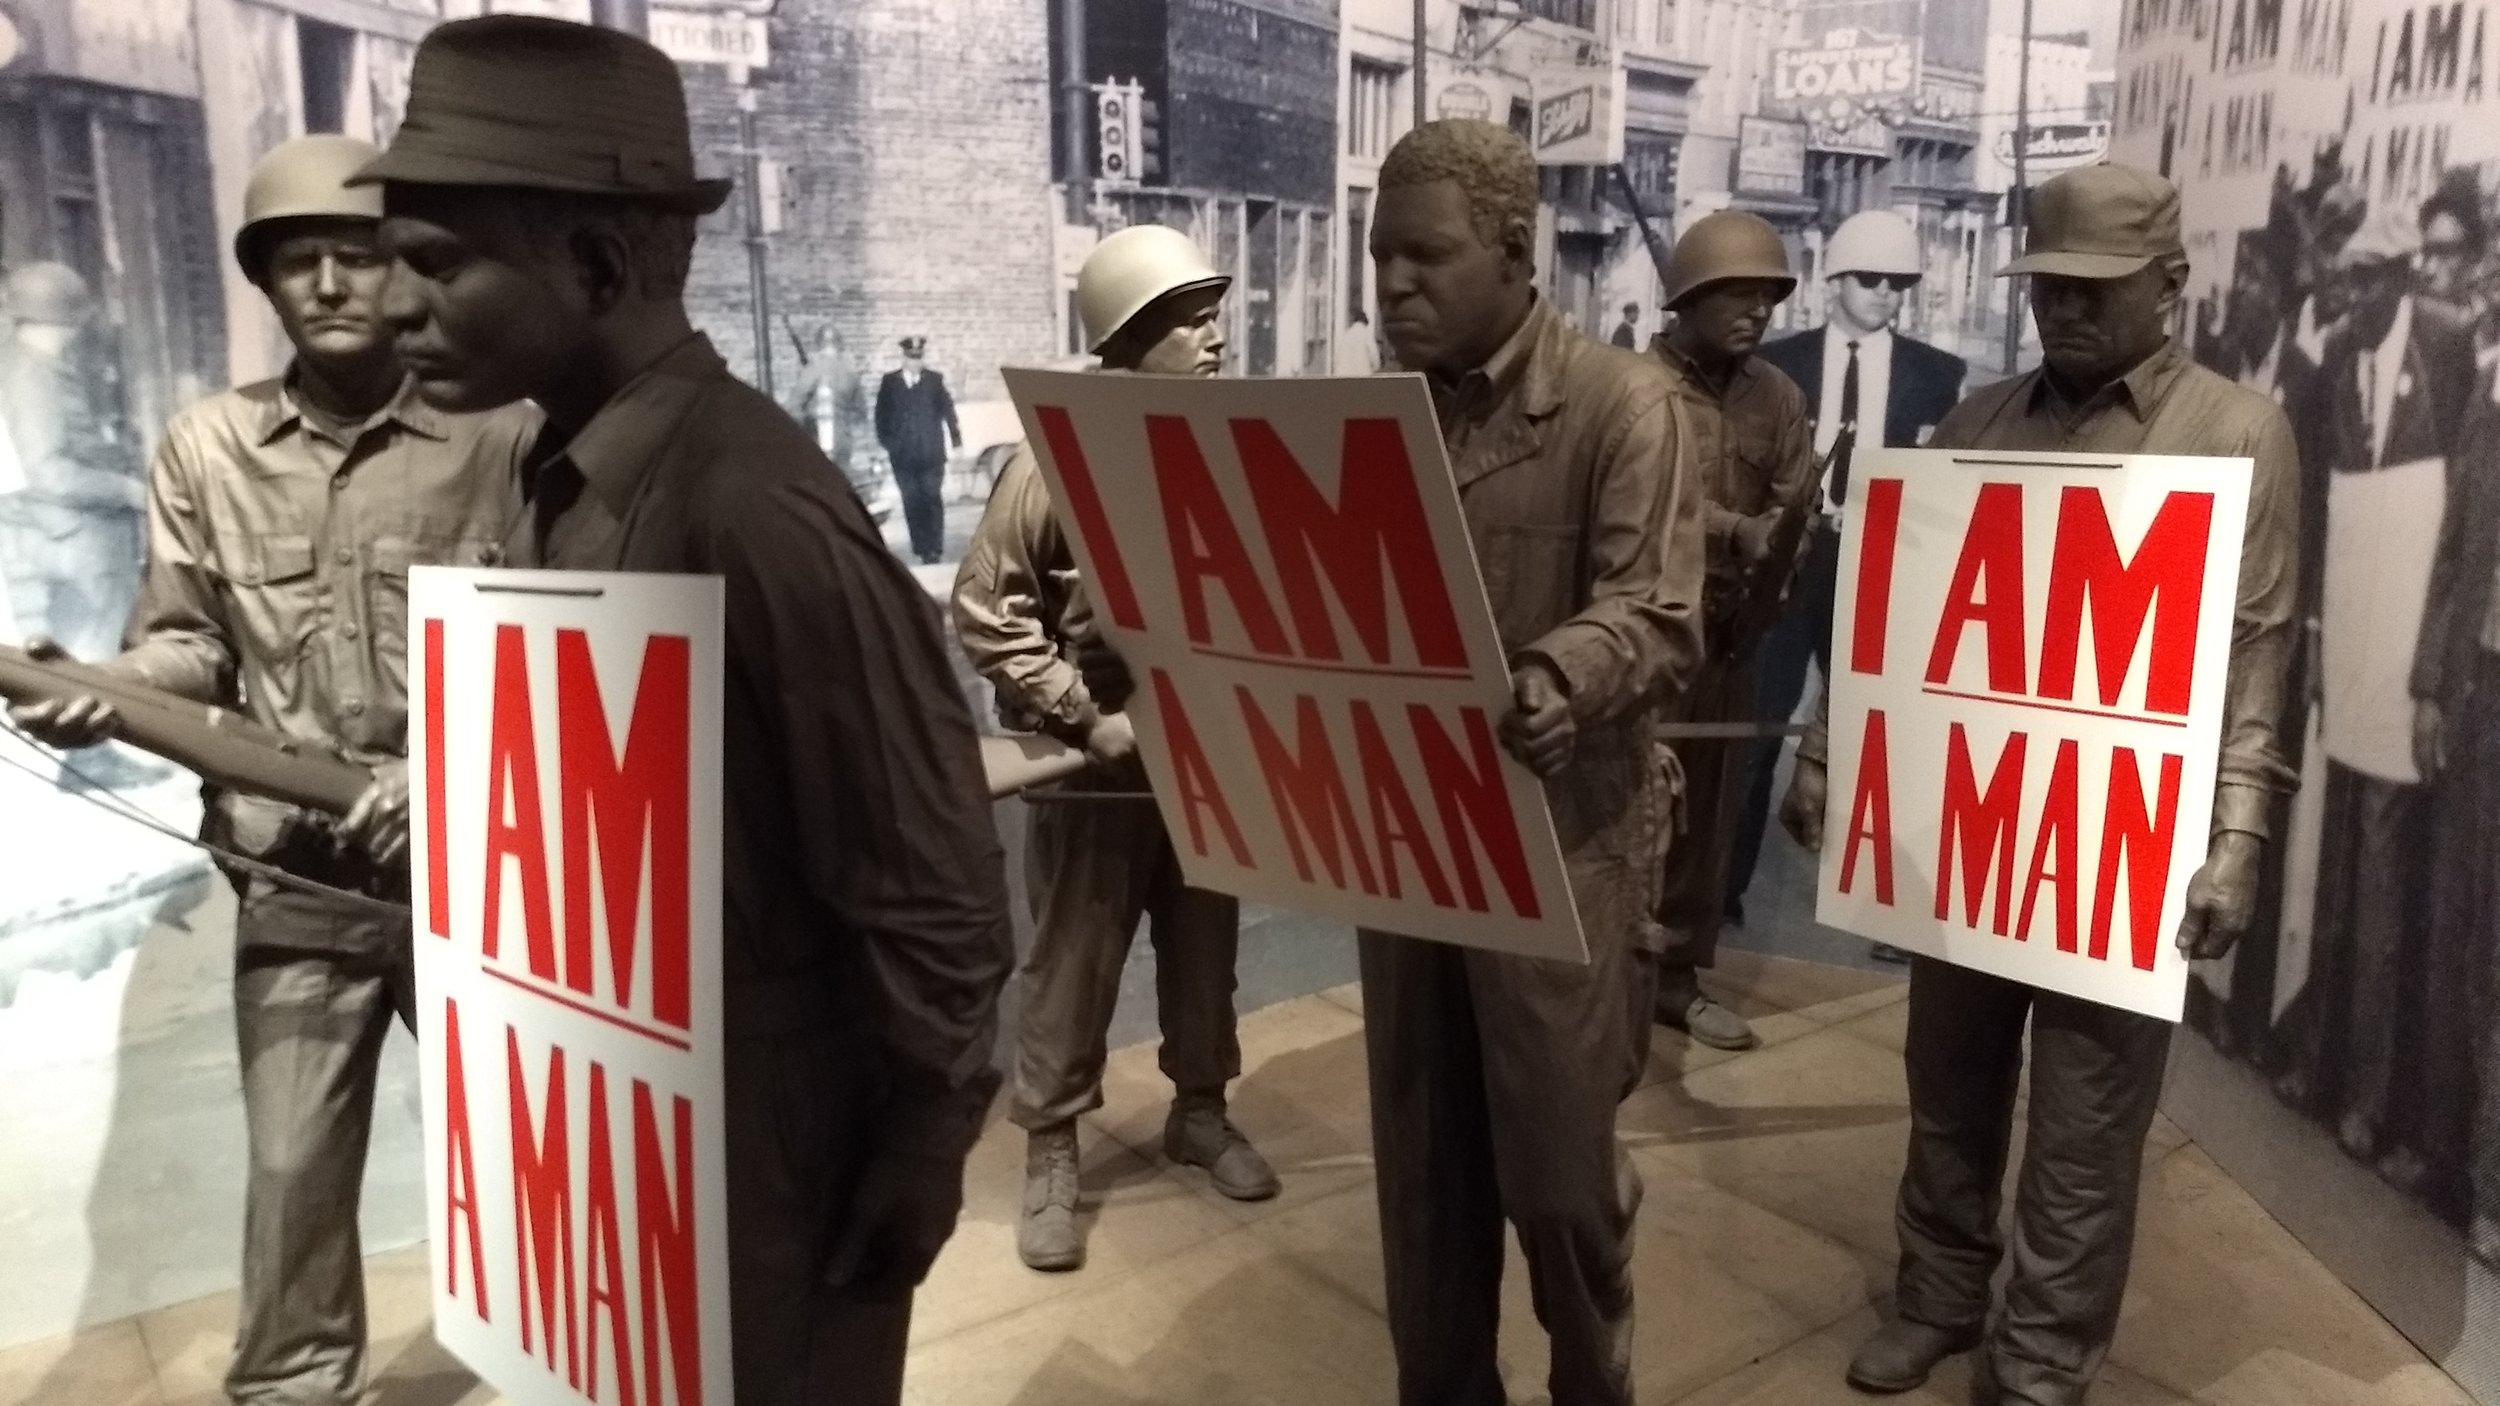 Sanitation workers strike in Memphis